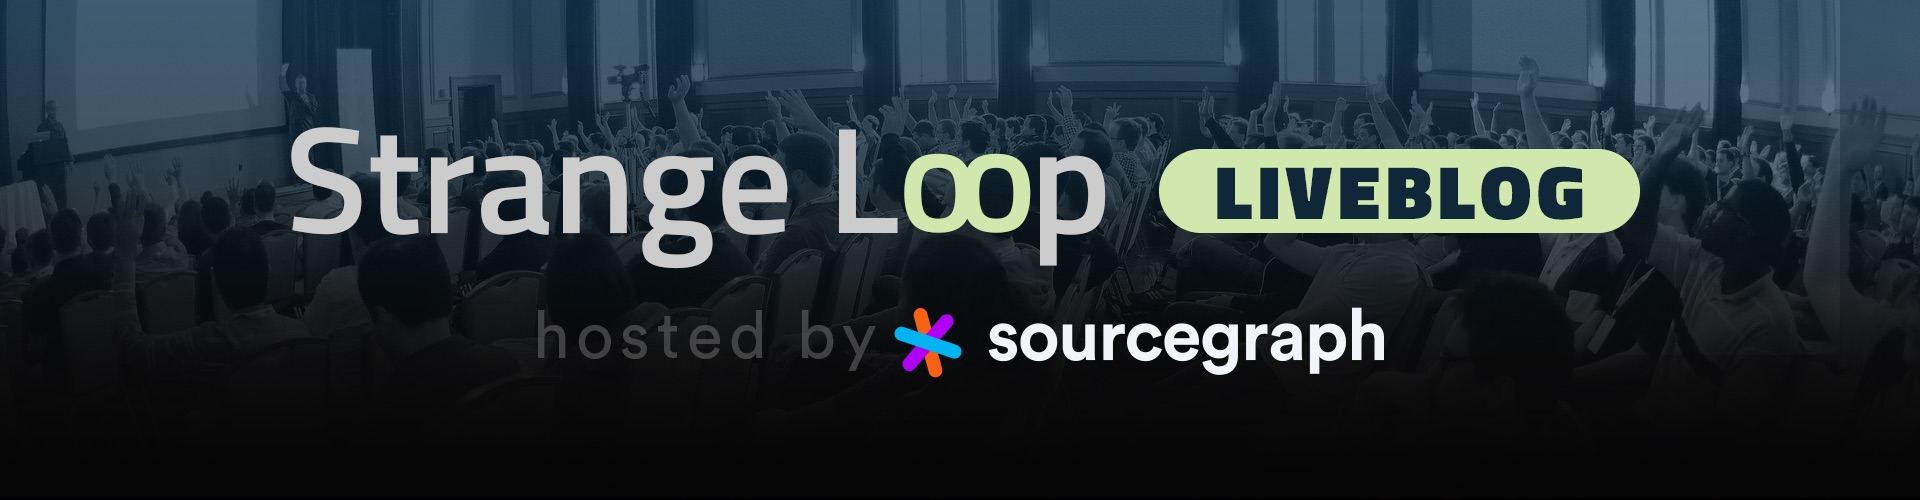 Strange Loop 2019 Banner